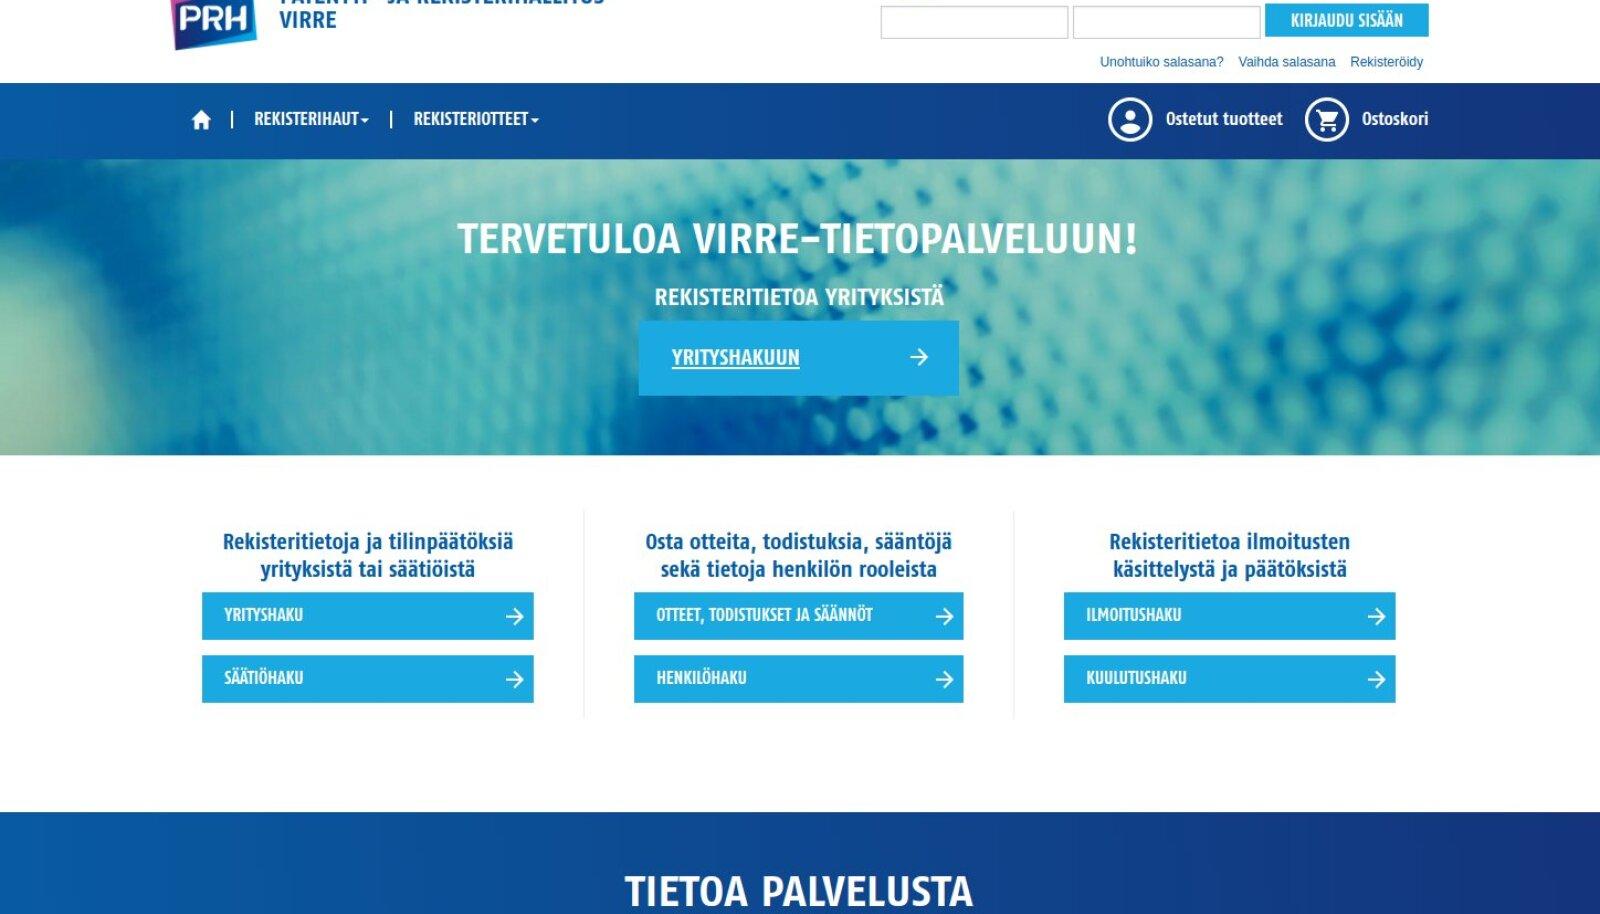 Soome registrivalitsuse PRH äriregistri lehekülg.